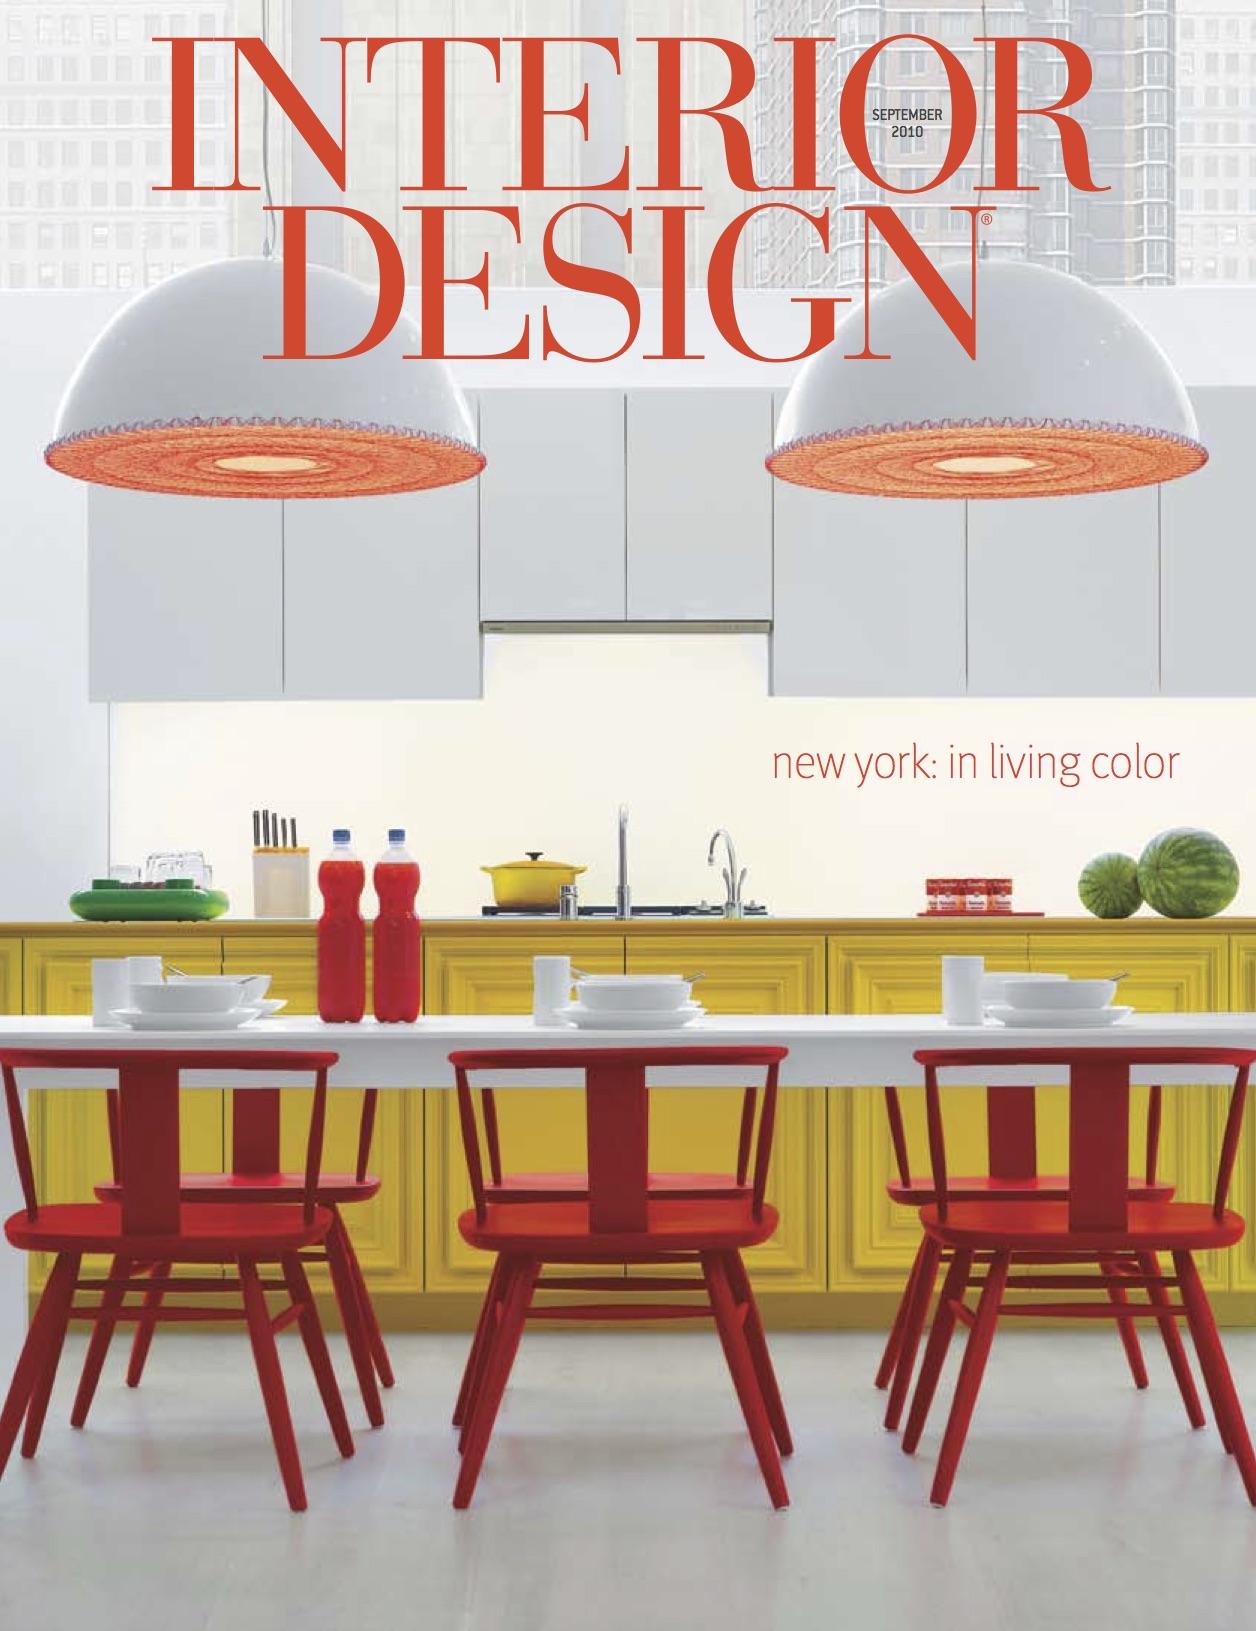 ATI+-+EB+Interior+Design+Article+September+2010+PRESENTATION+pdf.jpg